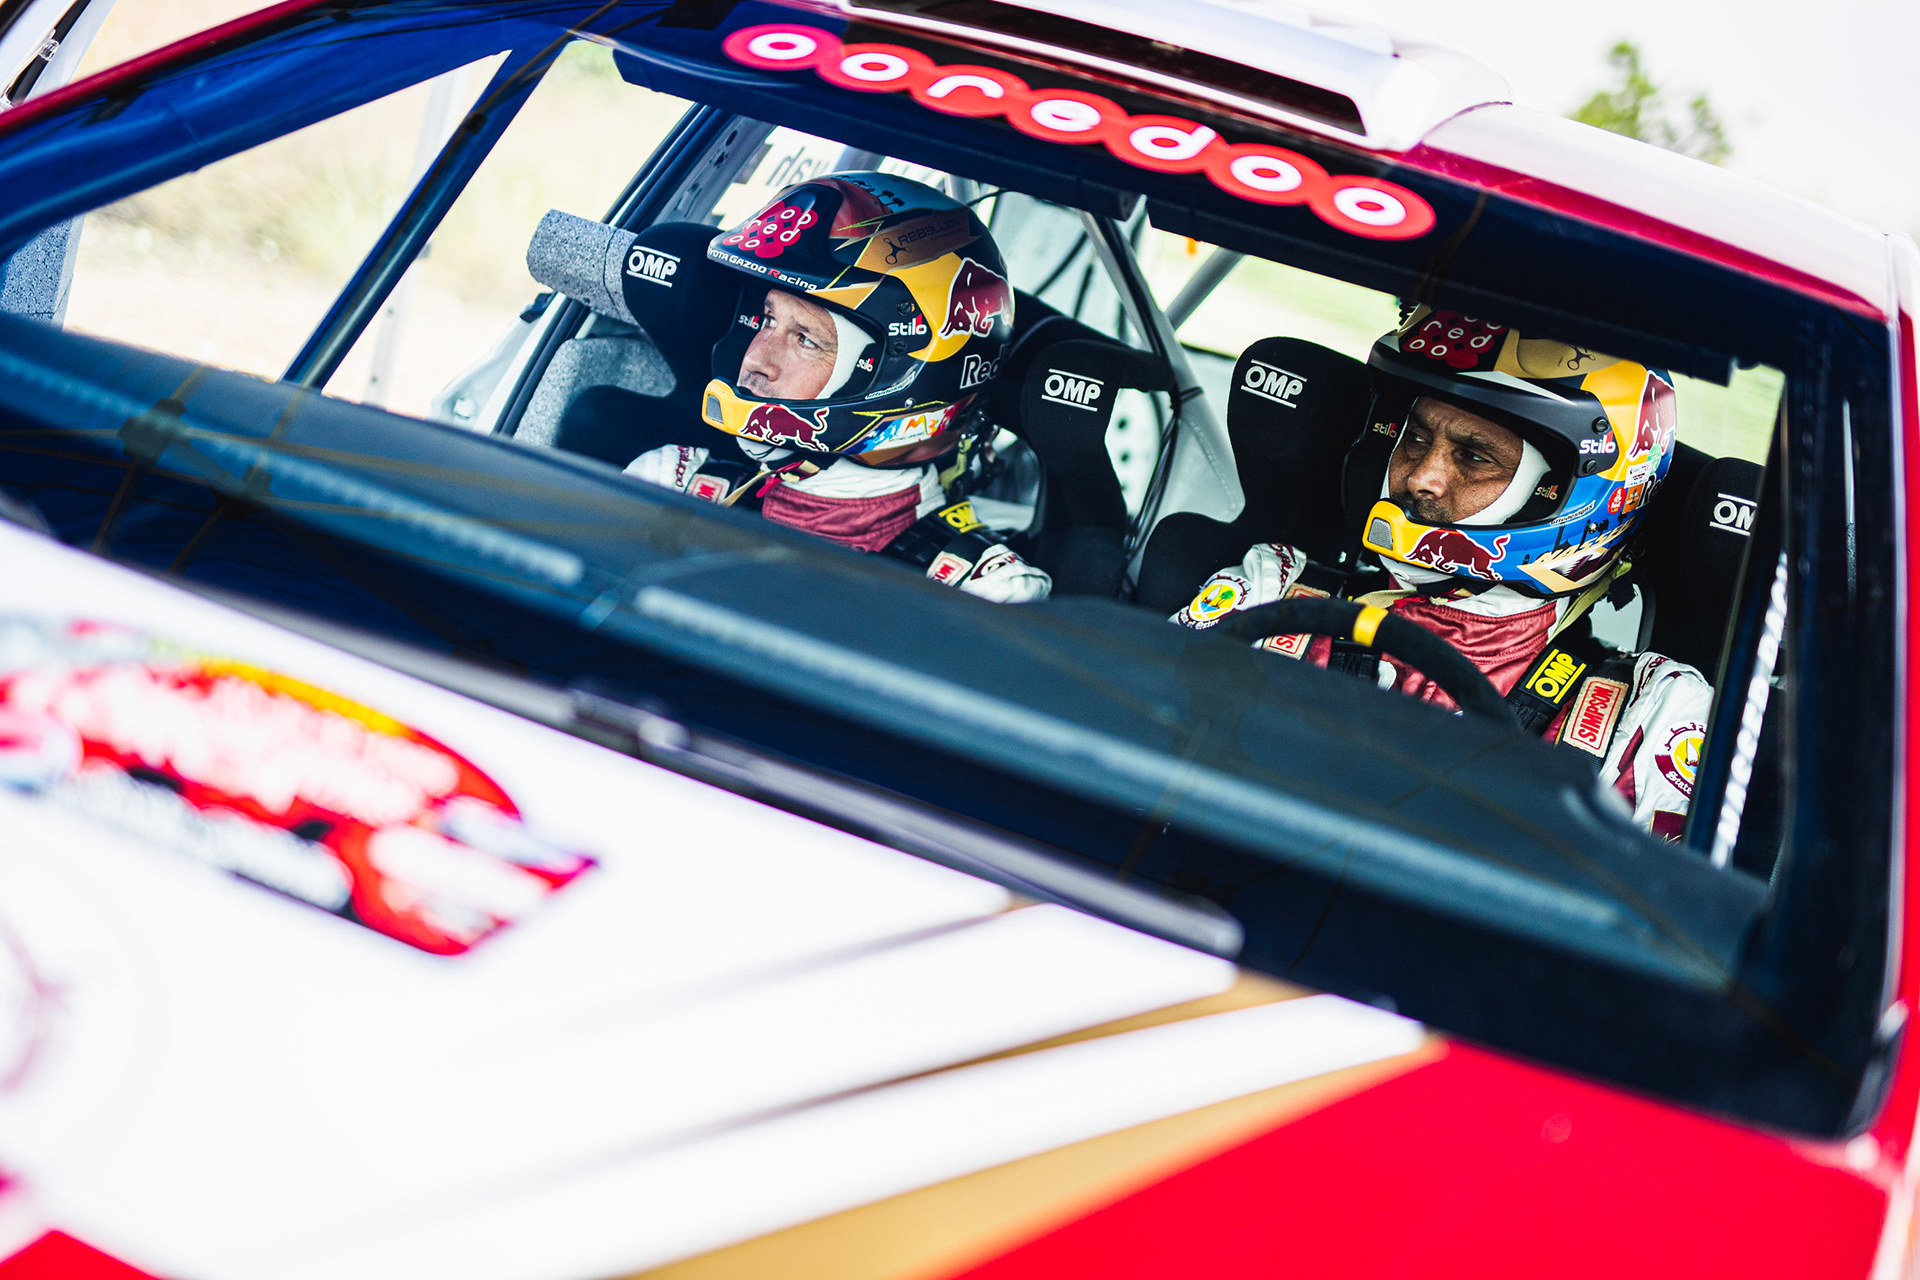 Nasser Al-Attiyah triunfó en el nuevo CERT - GT2i